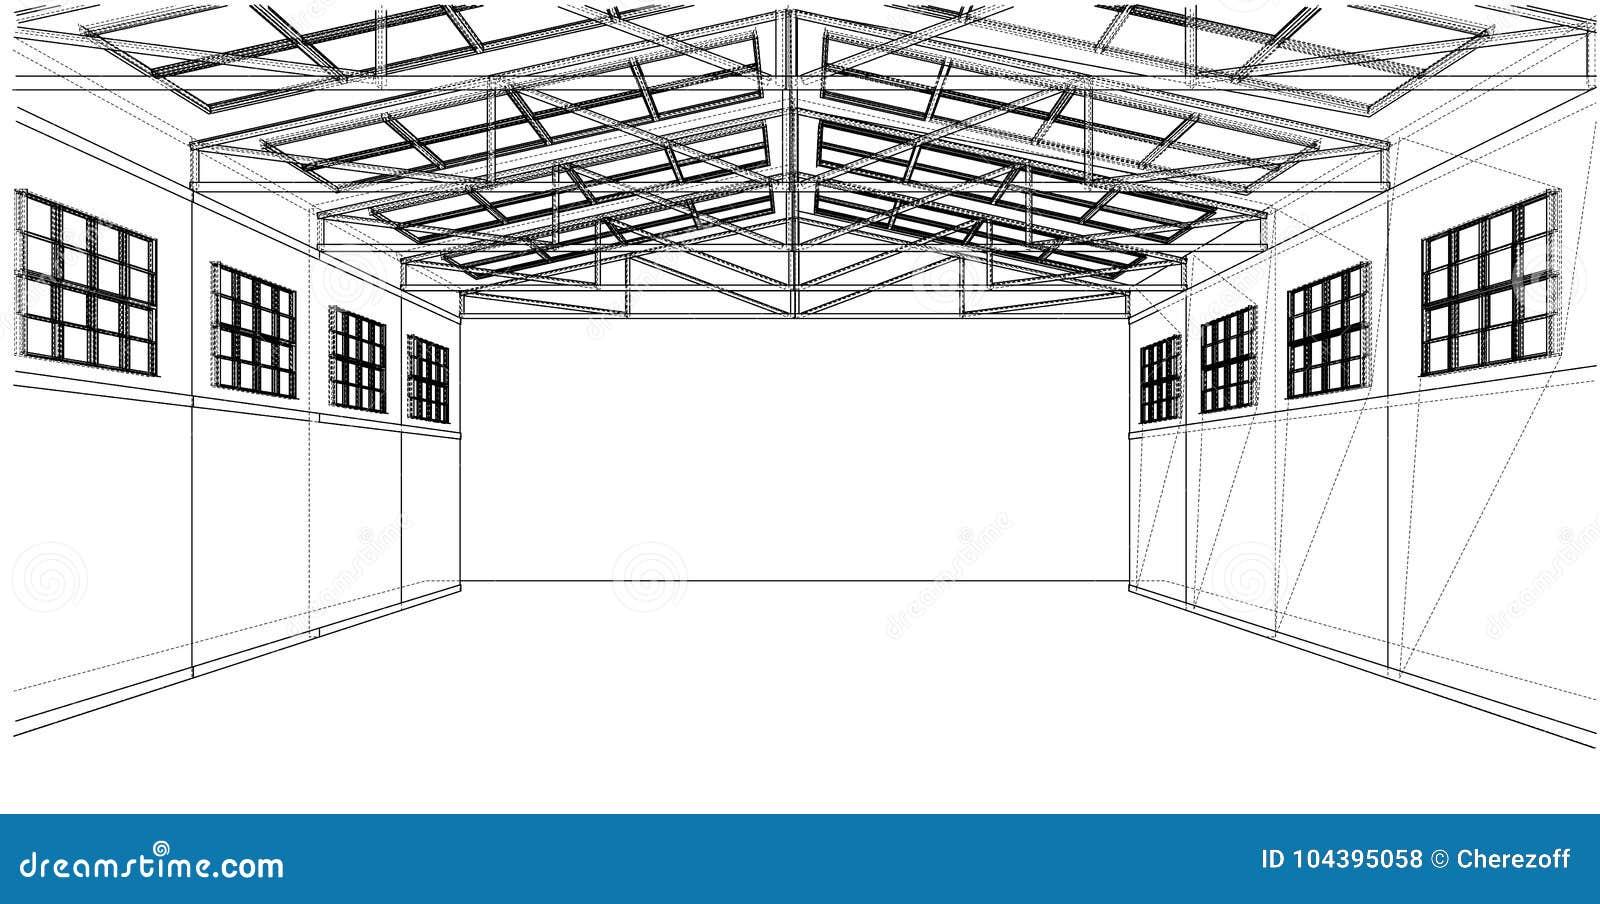 Warehouse Sketch. Vector Rendering Of 3d Stock Vector - Illustration ...